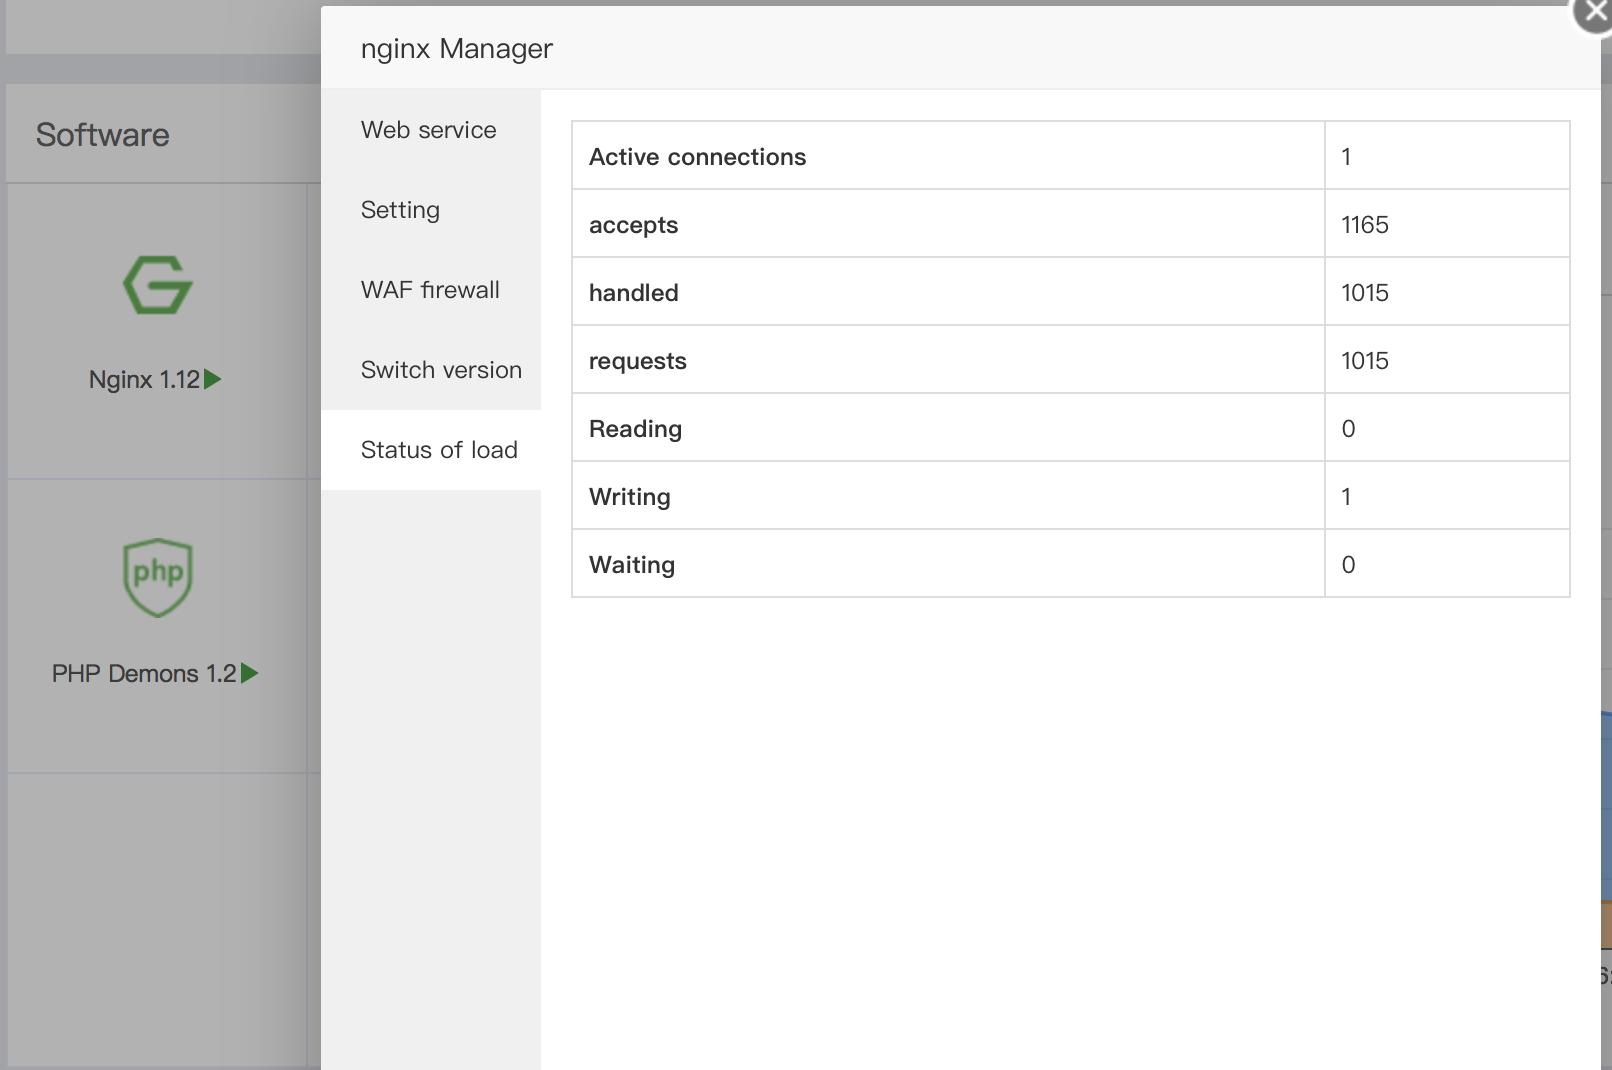 aapanel status of load nginx